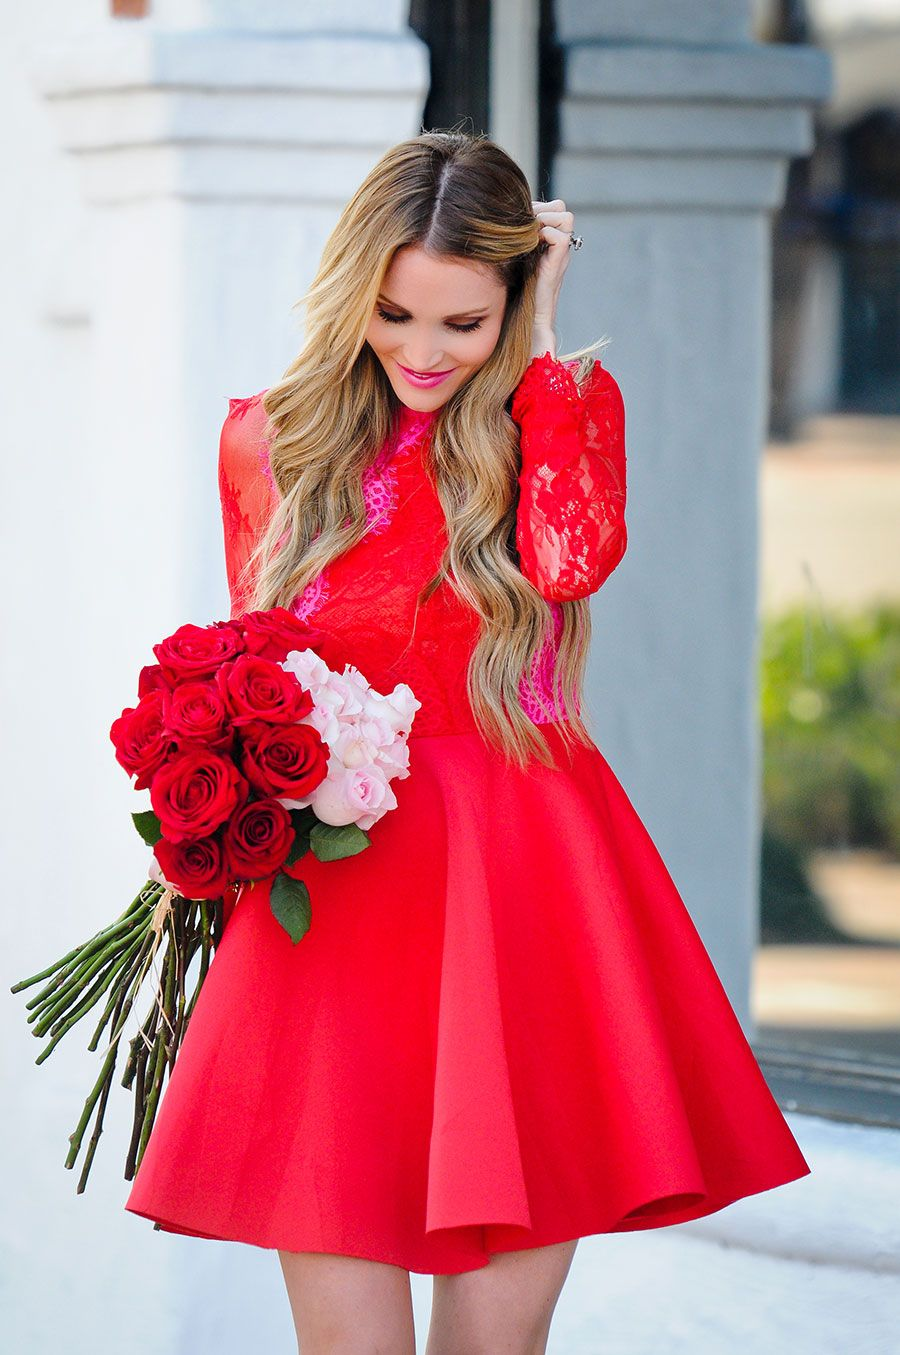 Dress dress dress my style pinboard pinterest